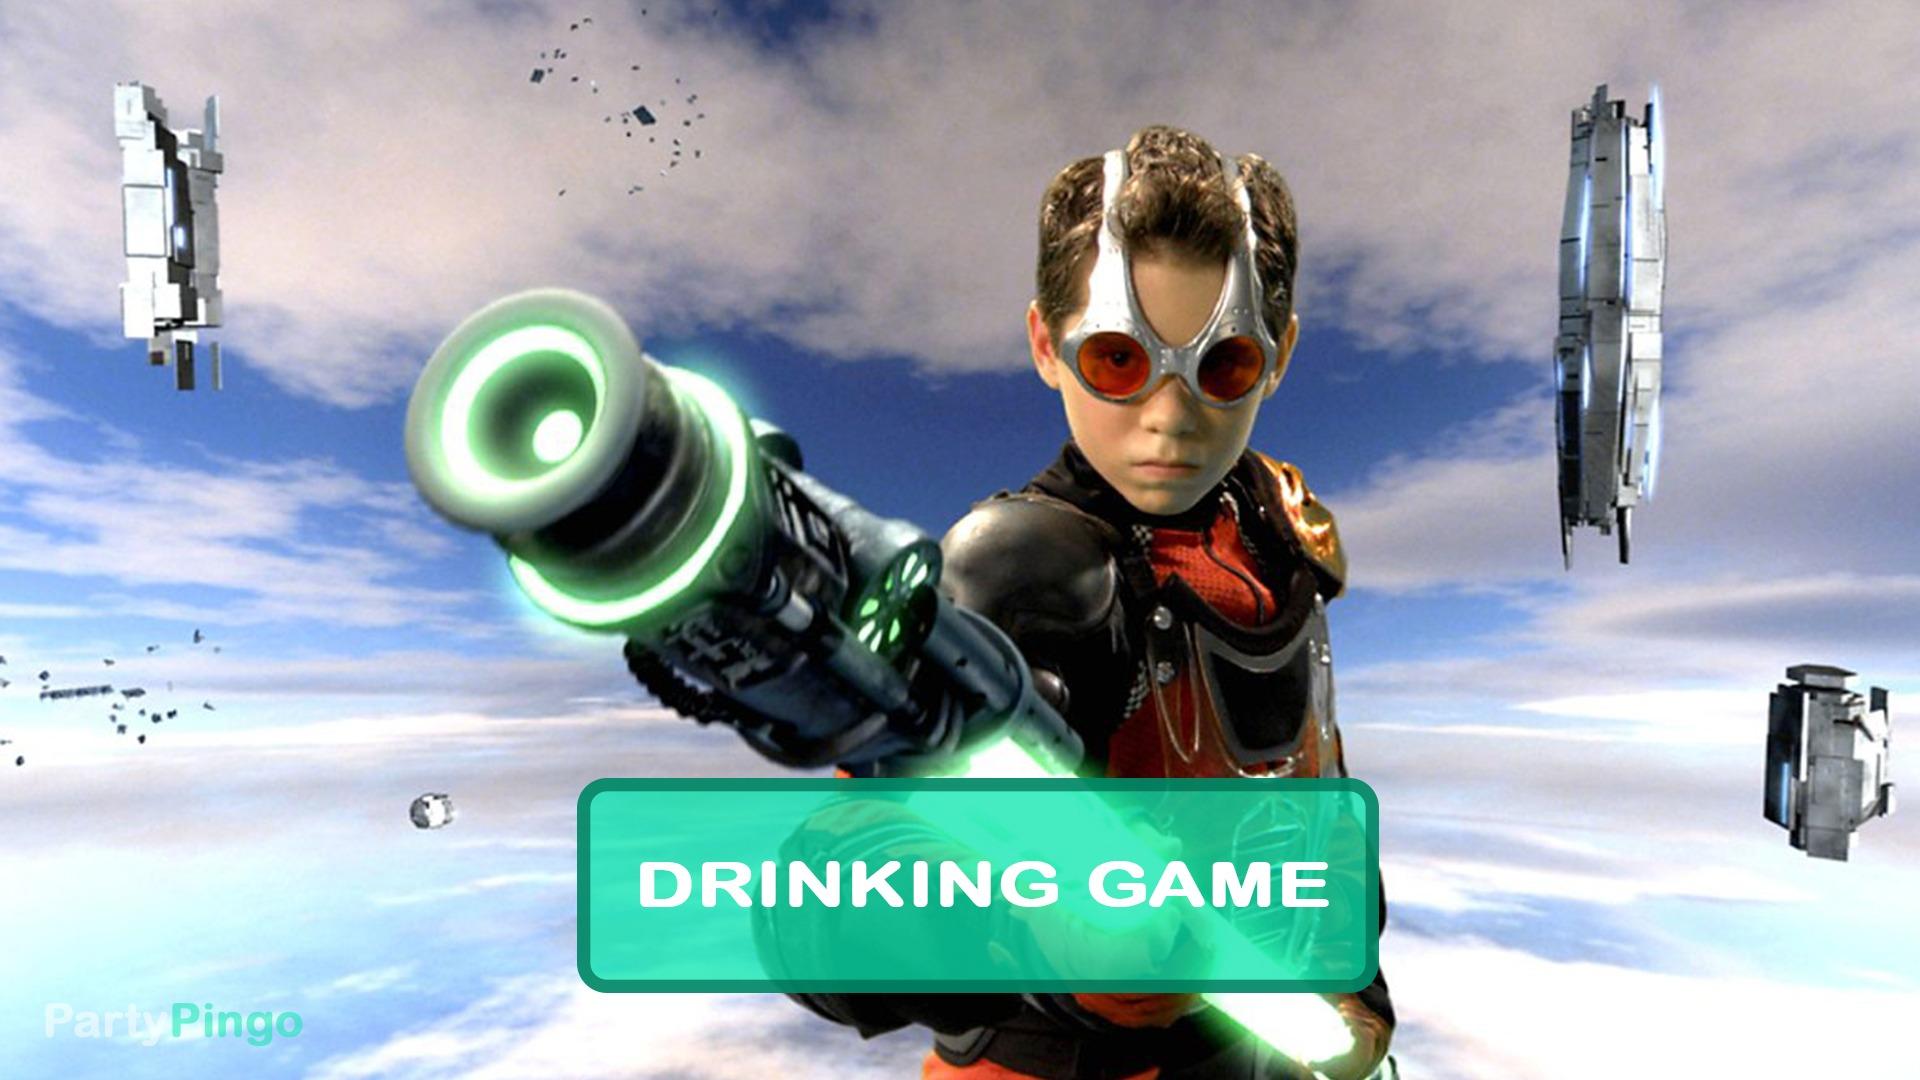 Spy Kids 3 Drinking Game